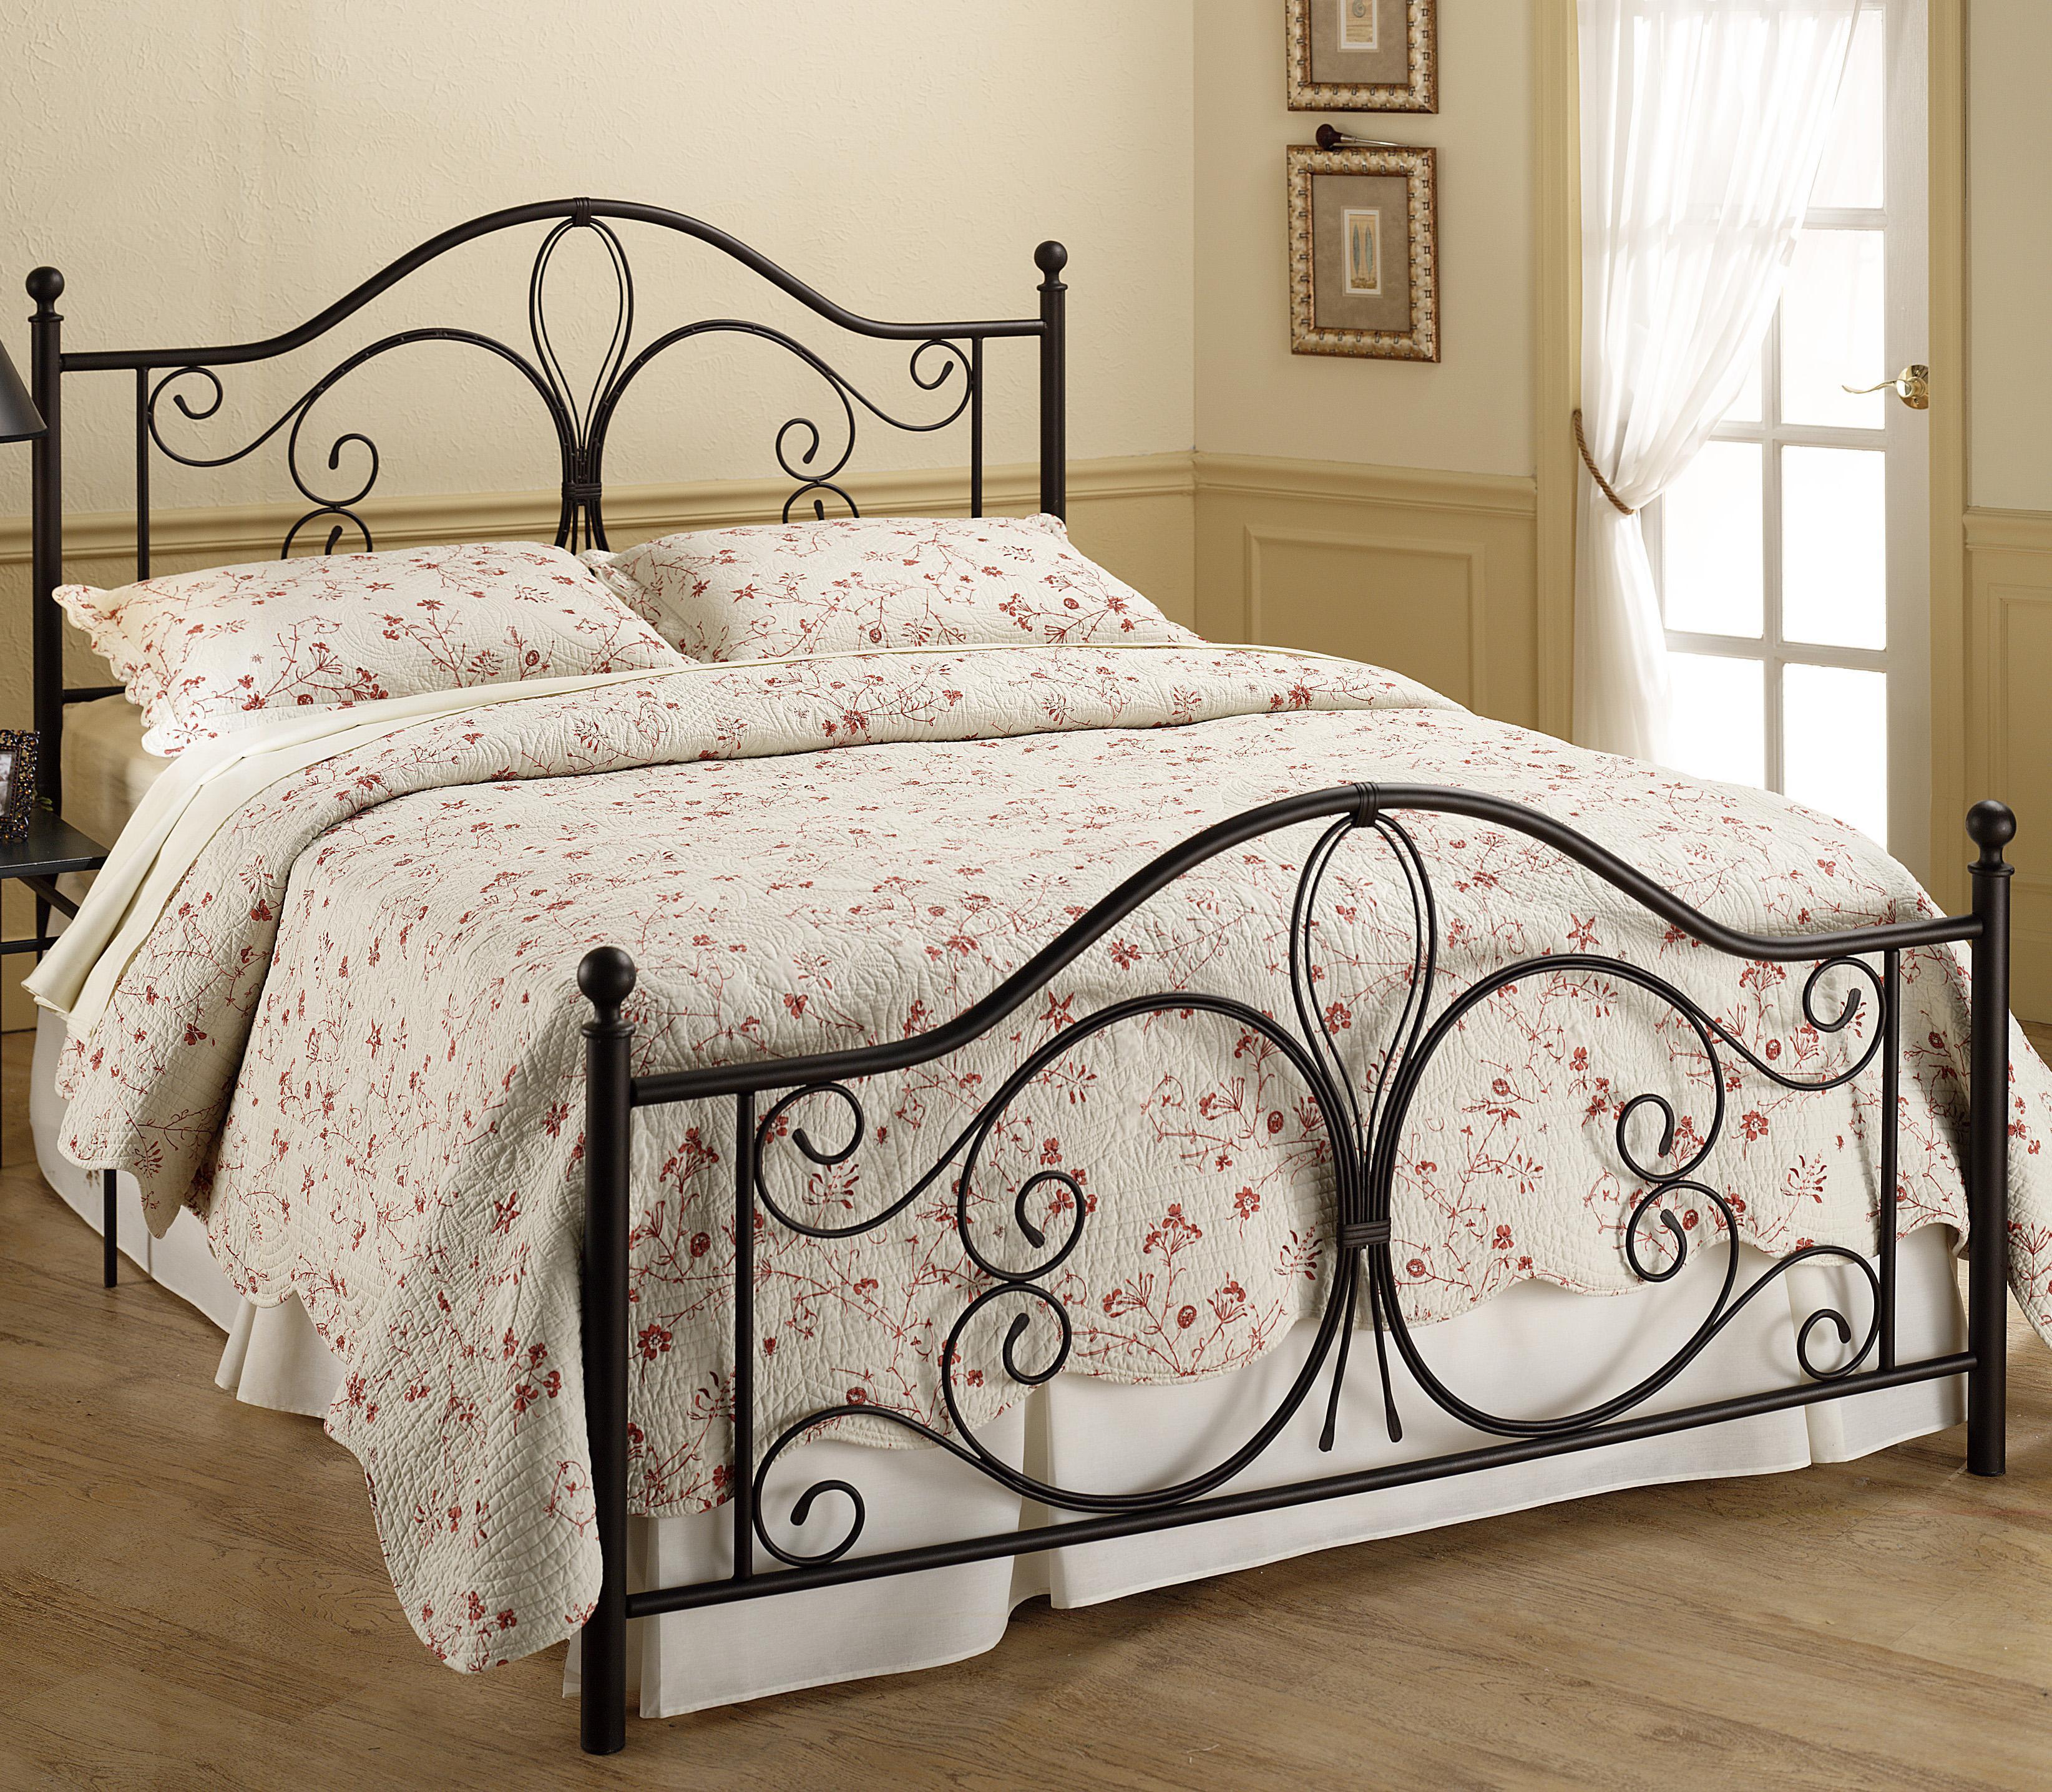 Hillsdale Metal Beds King Milwaukee Bed - Item Number: 1014BKR